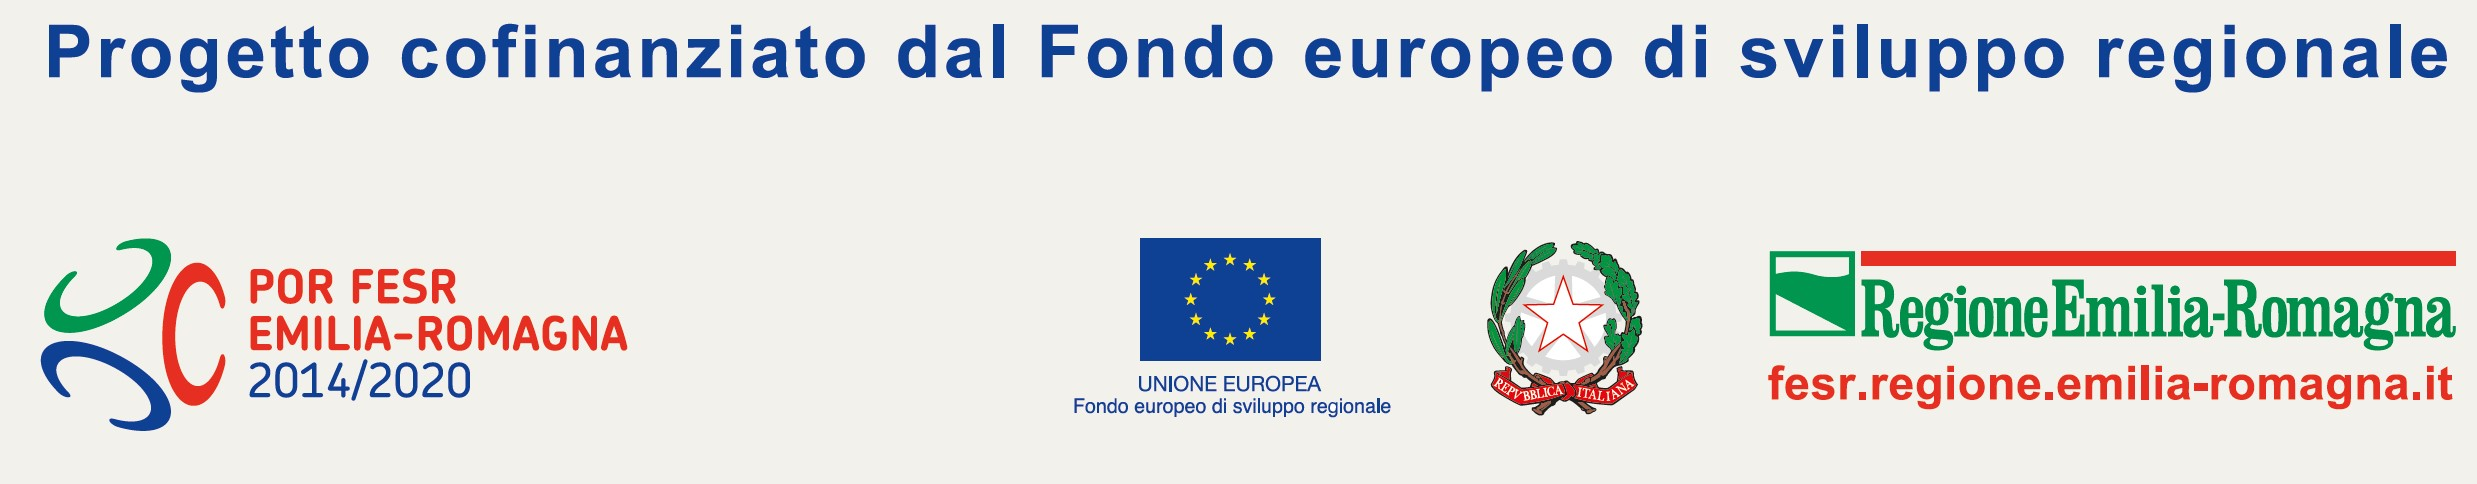 https://consorziopiacenzalimentare.com/wp-content/uploads/2020/12/banner-fondi-regionali.jpg